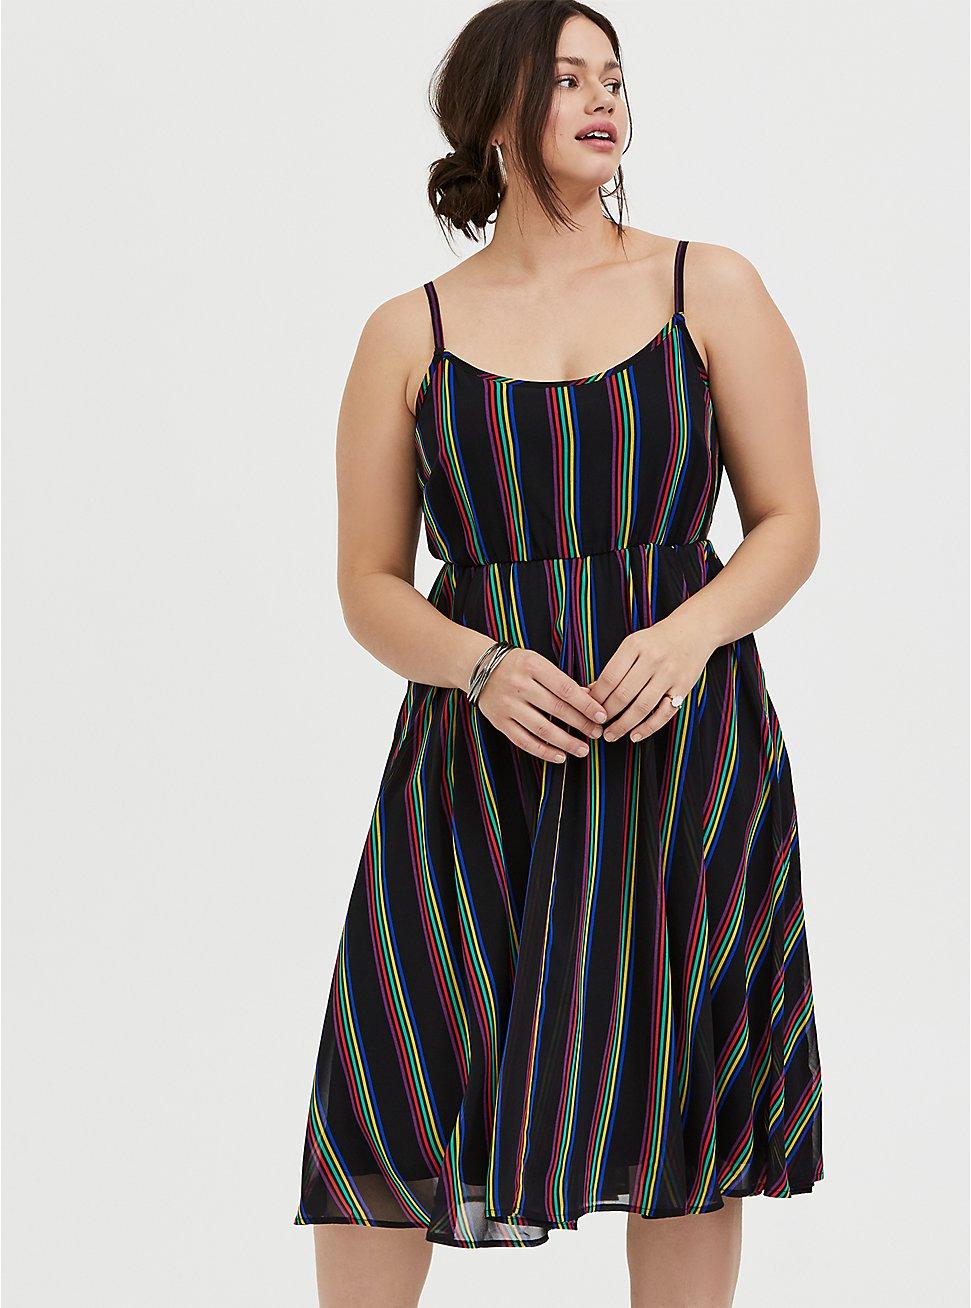 Black Rainbow Stripe Chiffon Dress 4